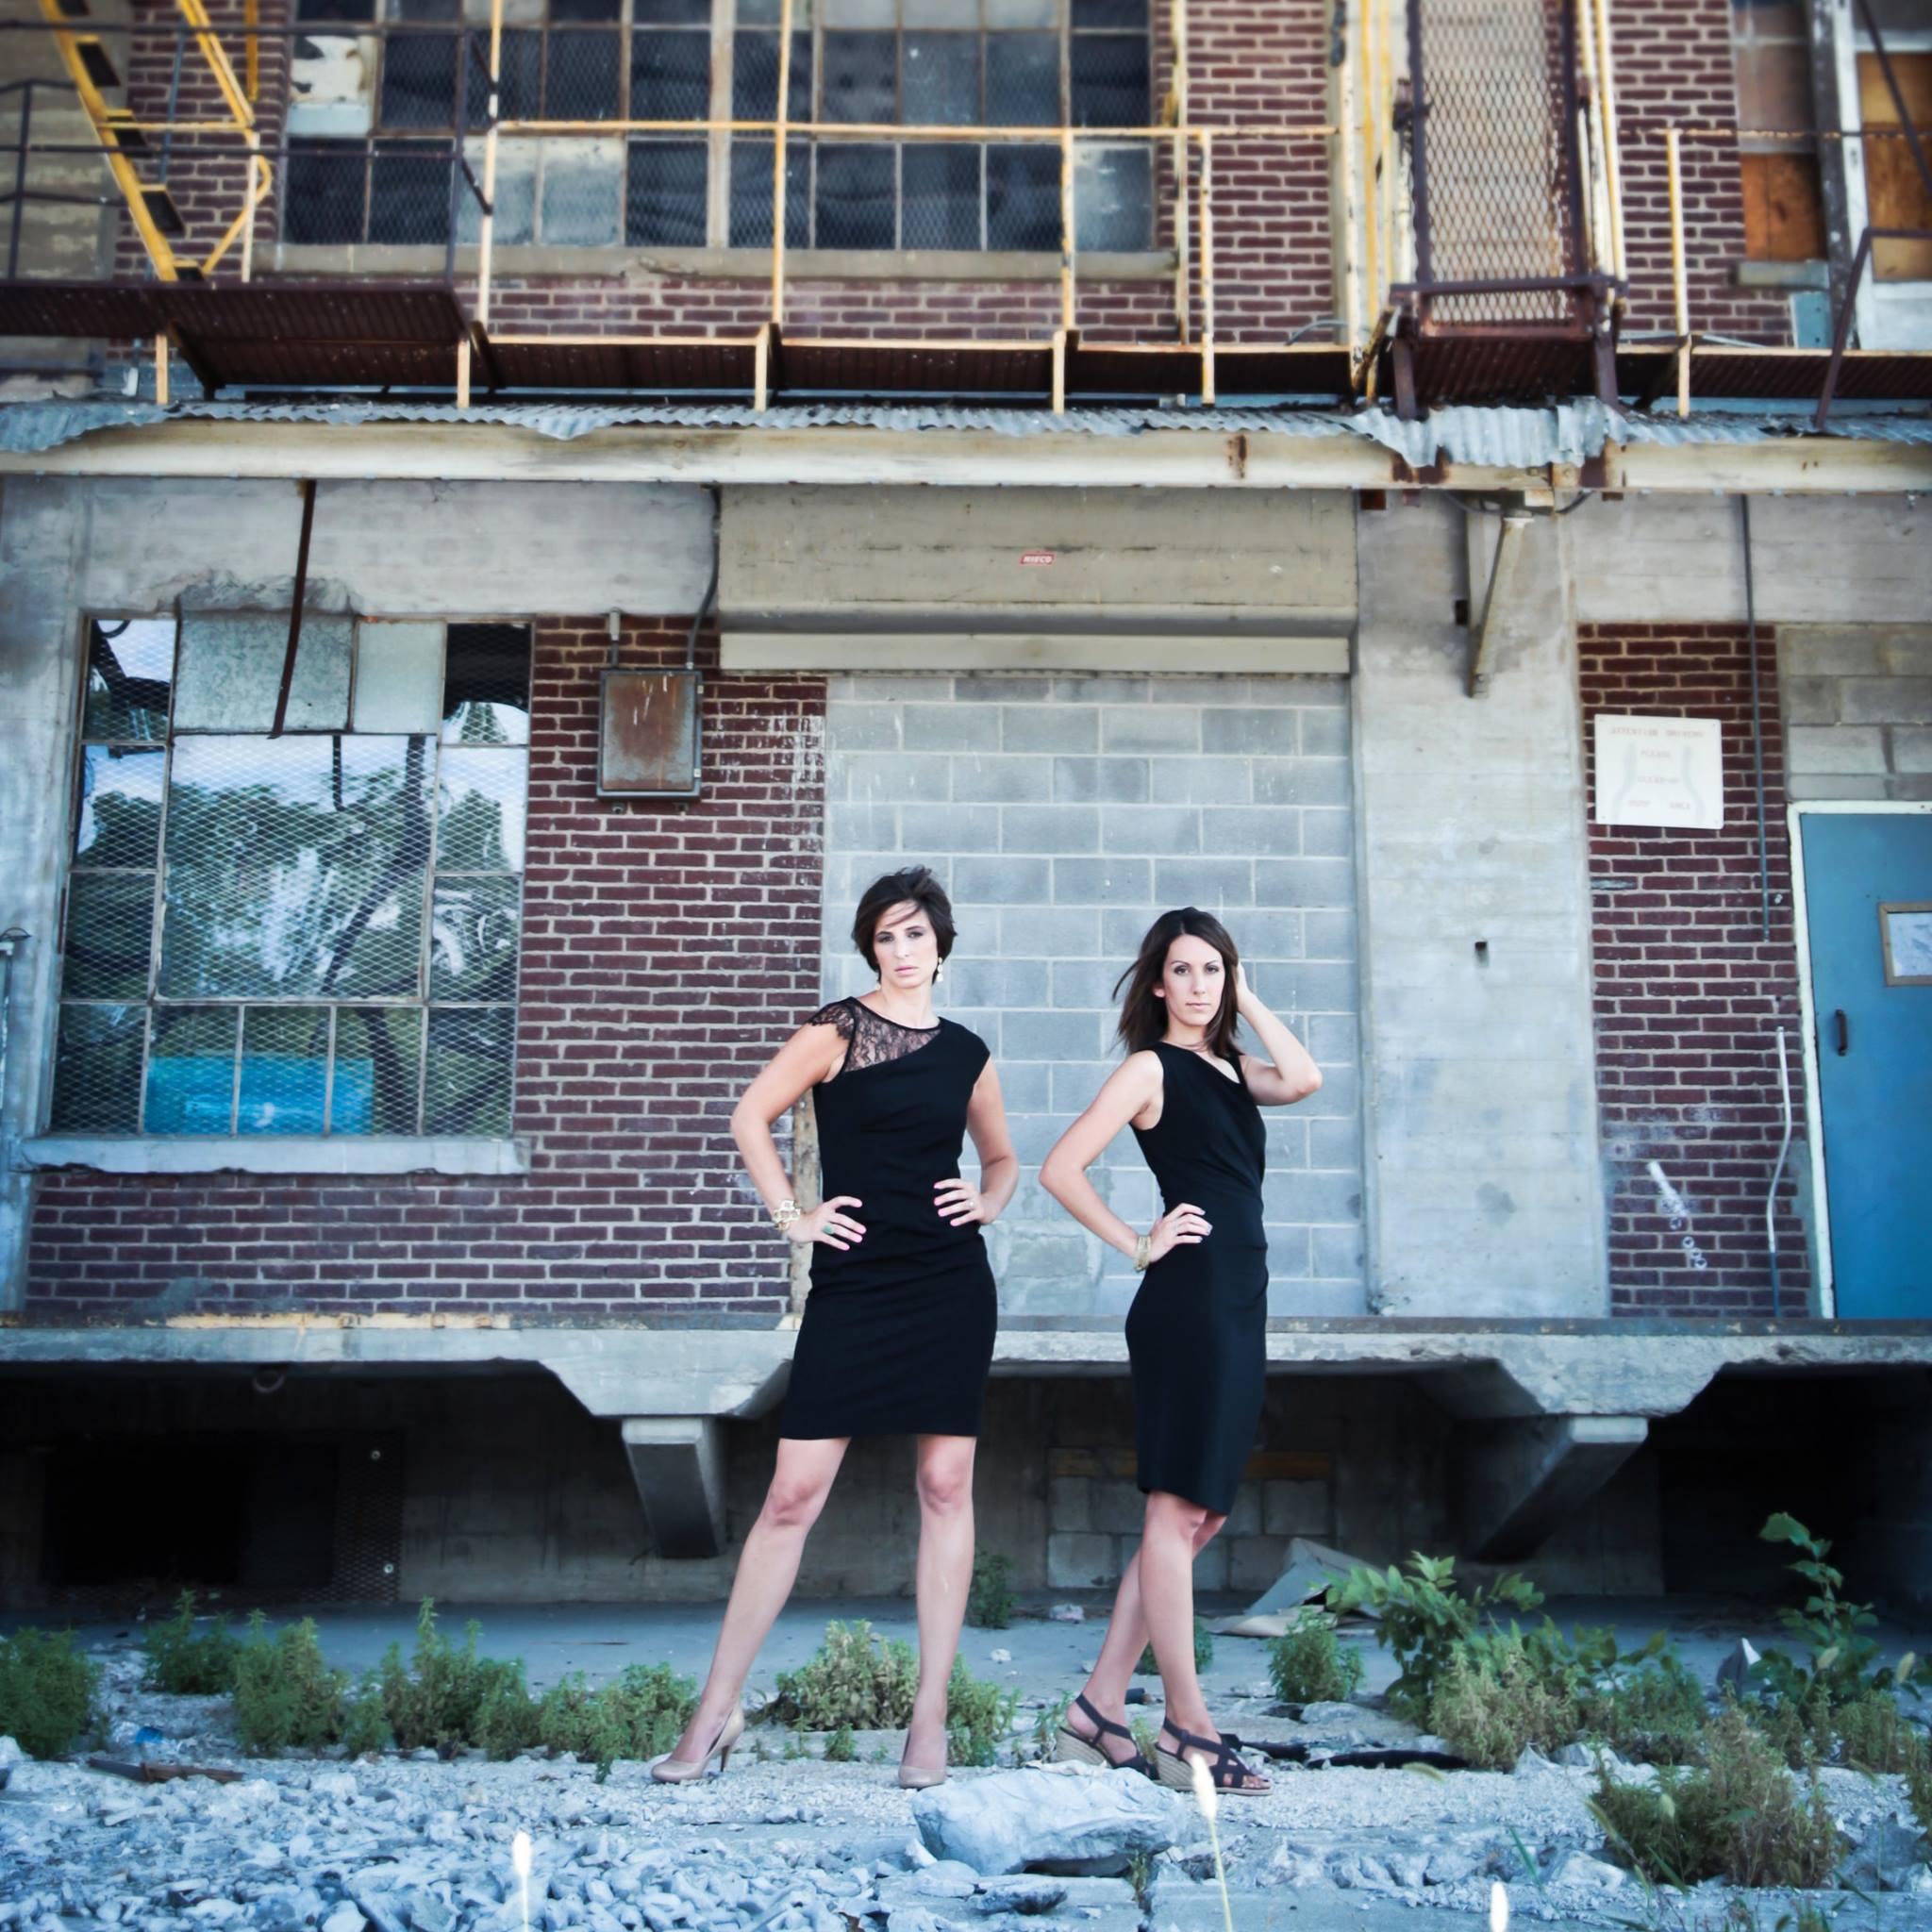 Denver Co Uber Shooting: Melissa And Beth